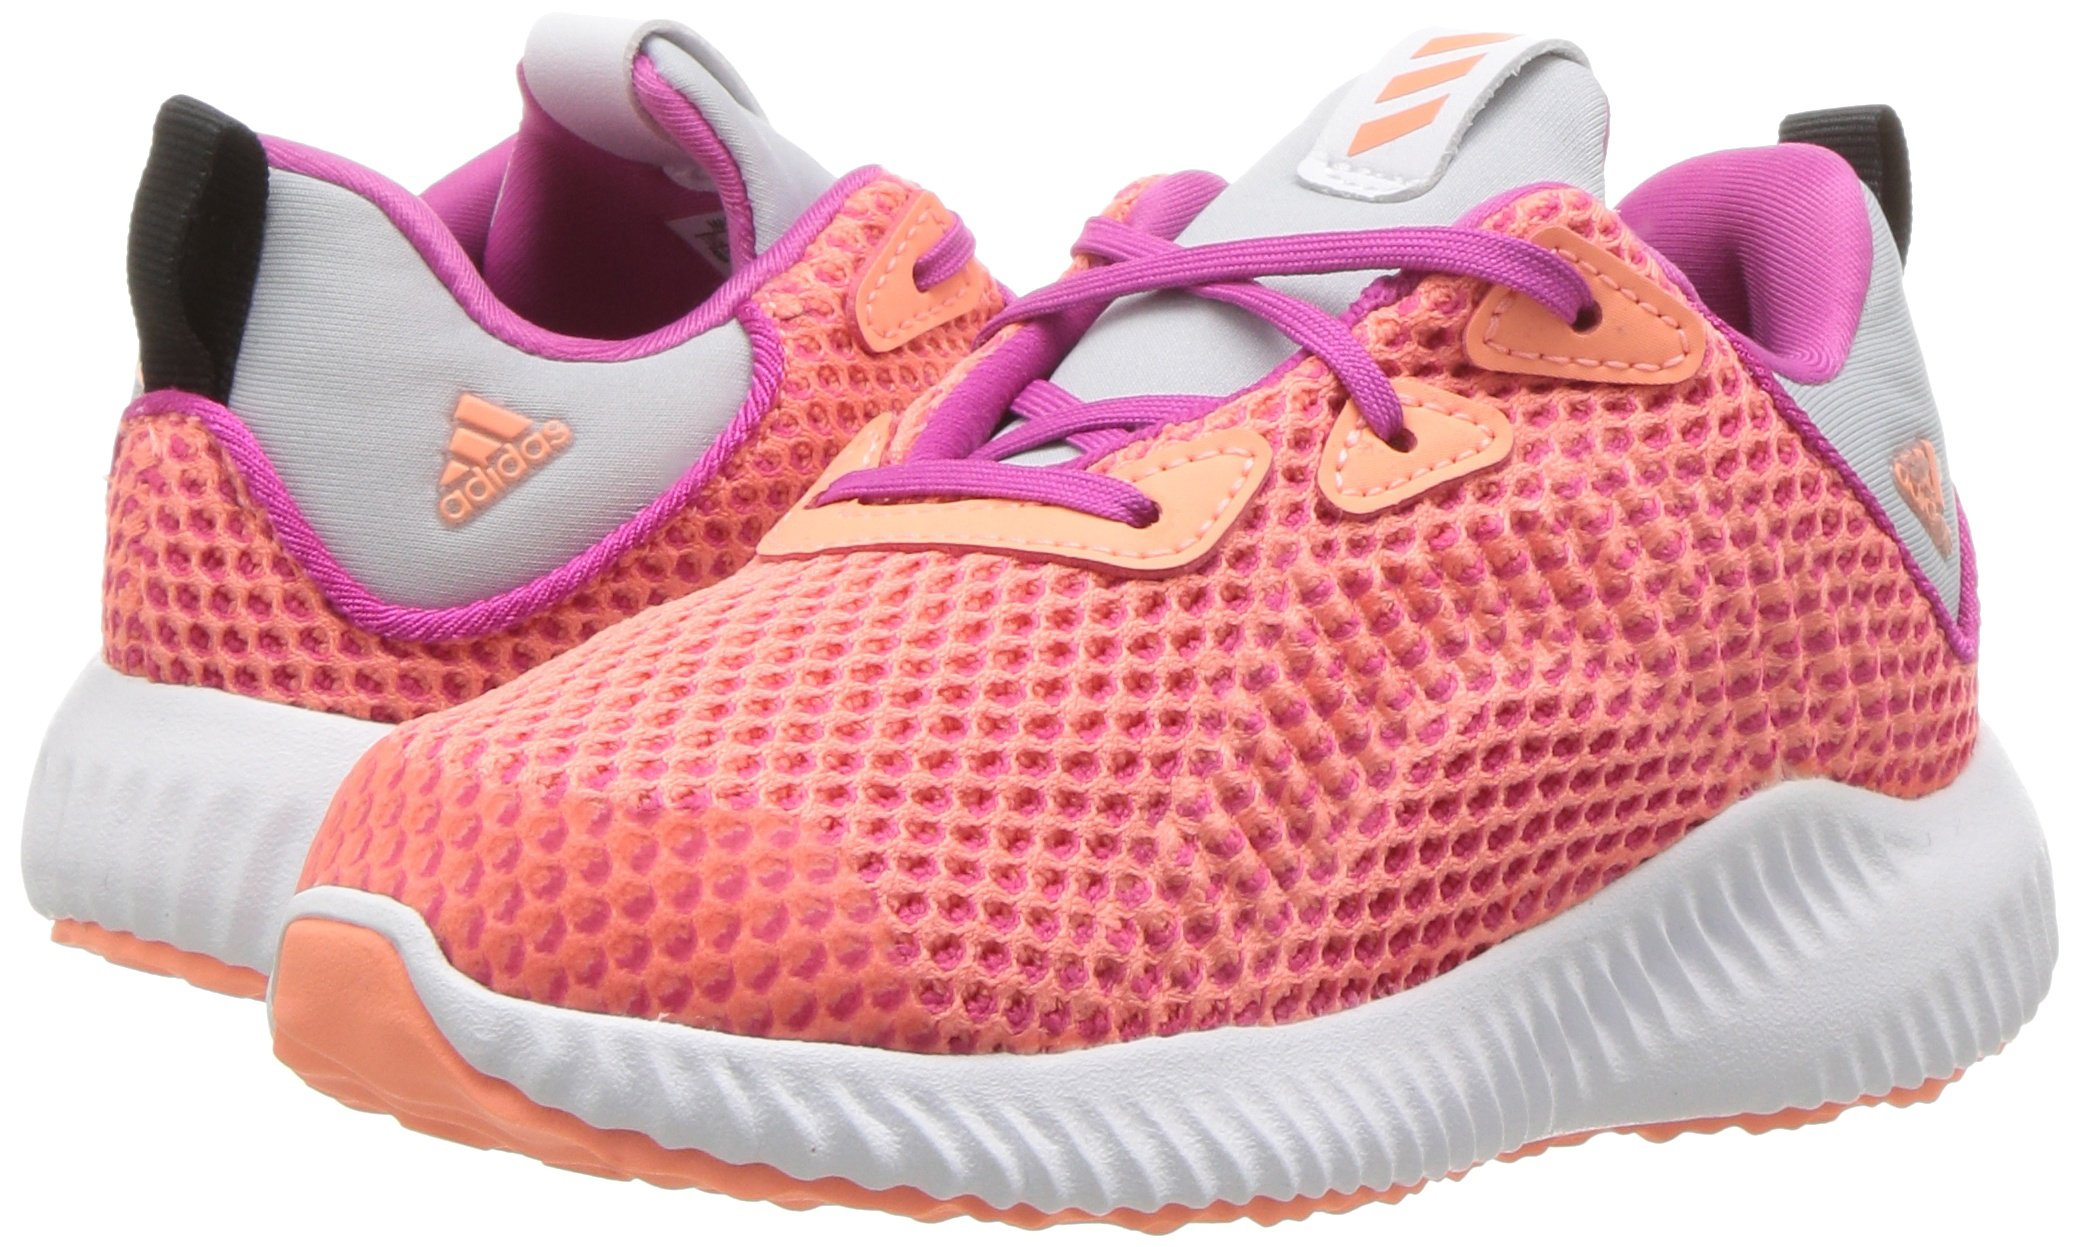 adidas Kids' Alphabounce Running Shoe, Bahia Magenta/Sun Glow/Clear Grey, 4 Medium US Toddler by adidas (Image #6)